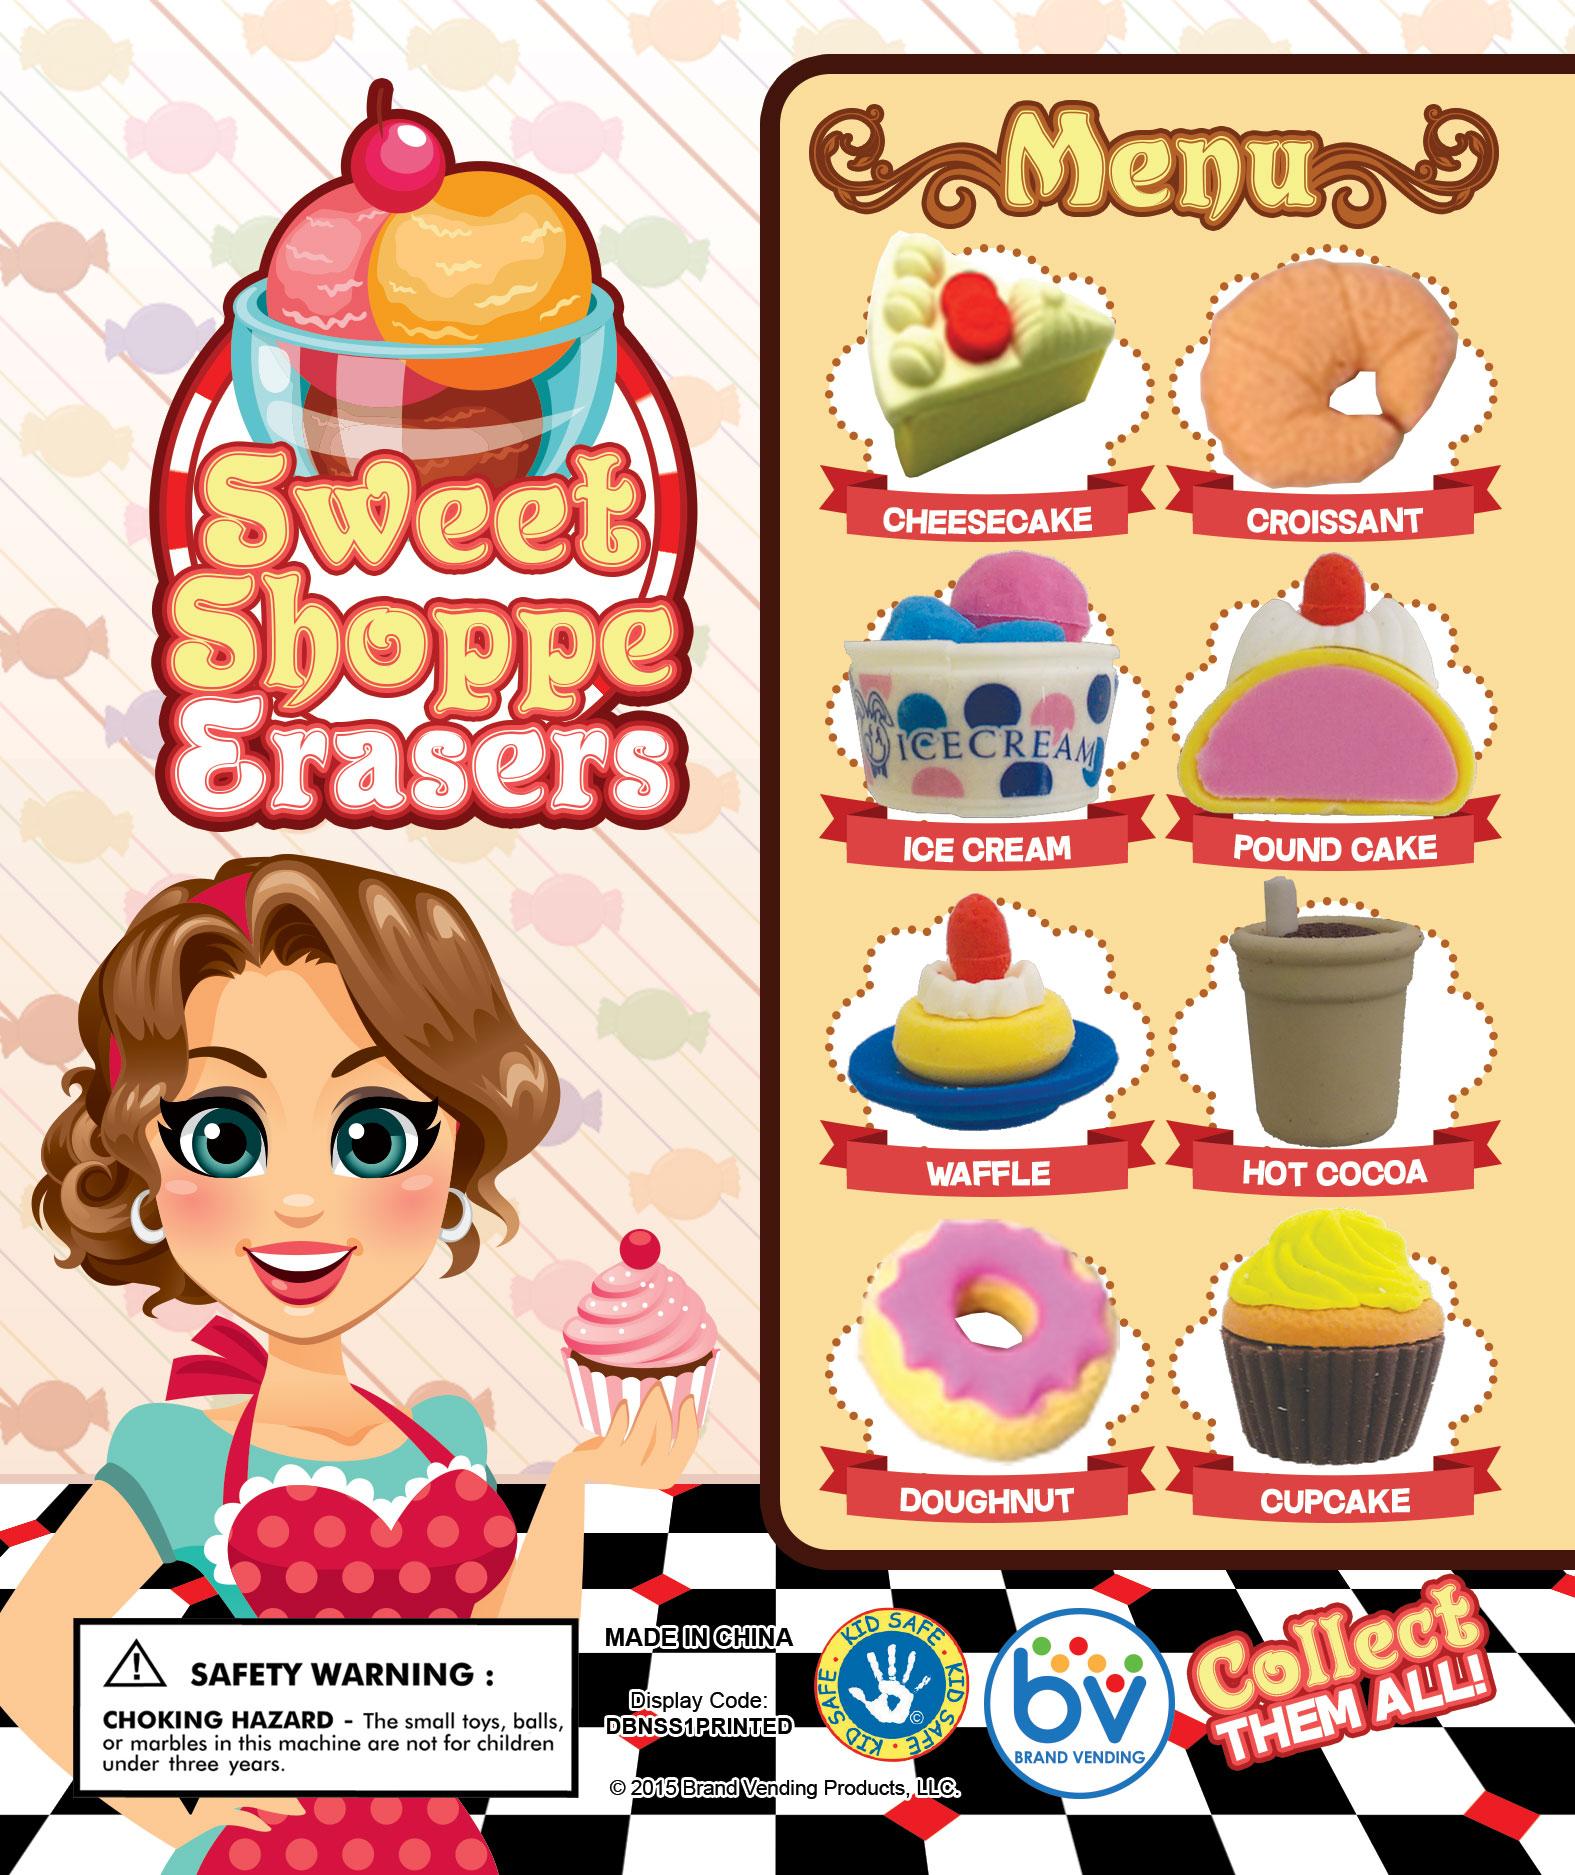 SweetShoppeErasers2